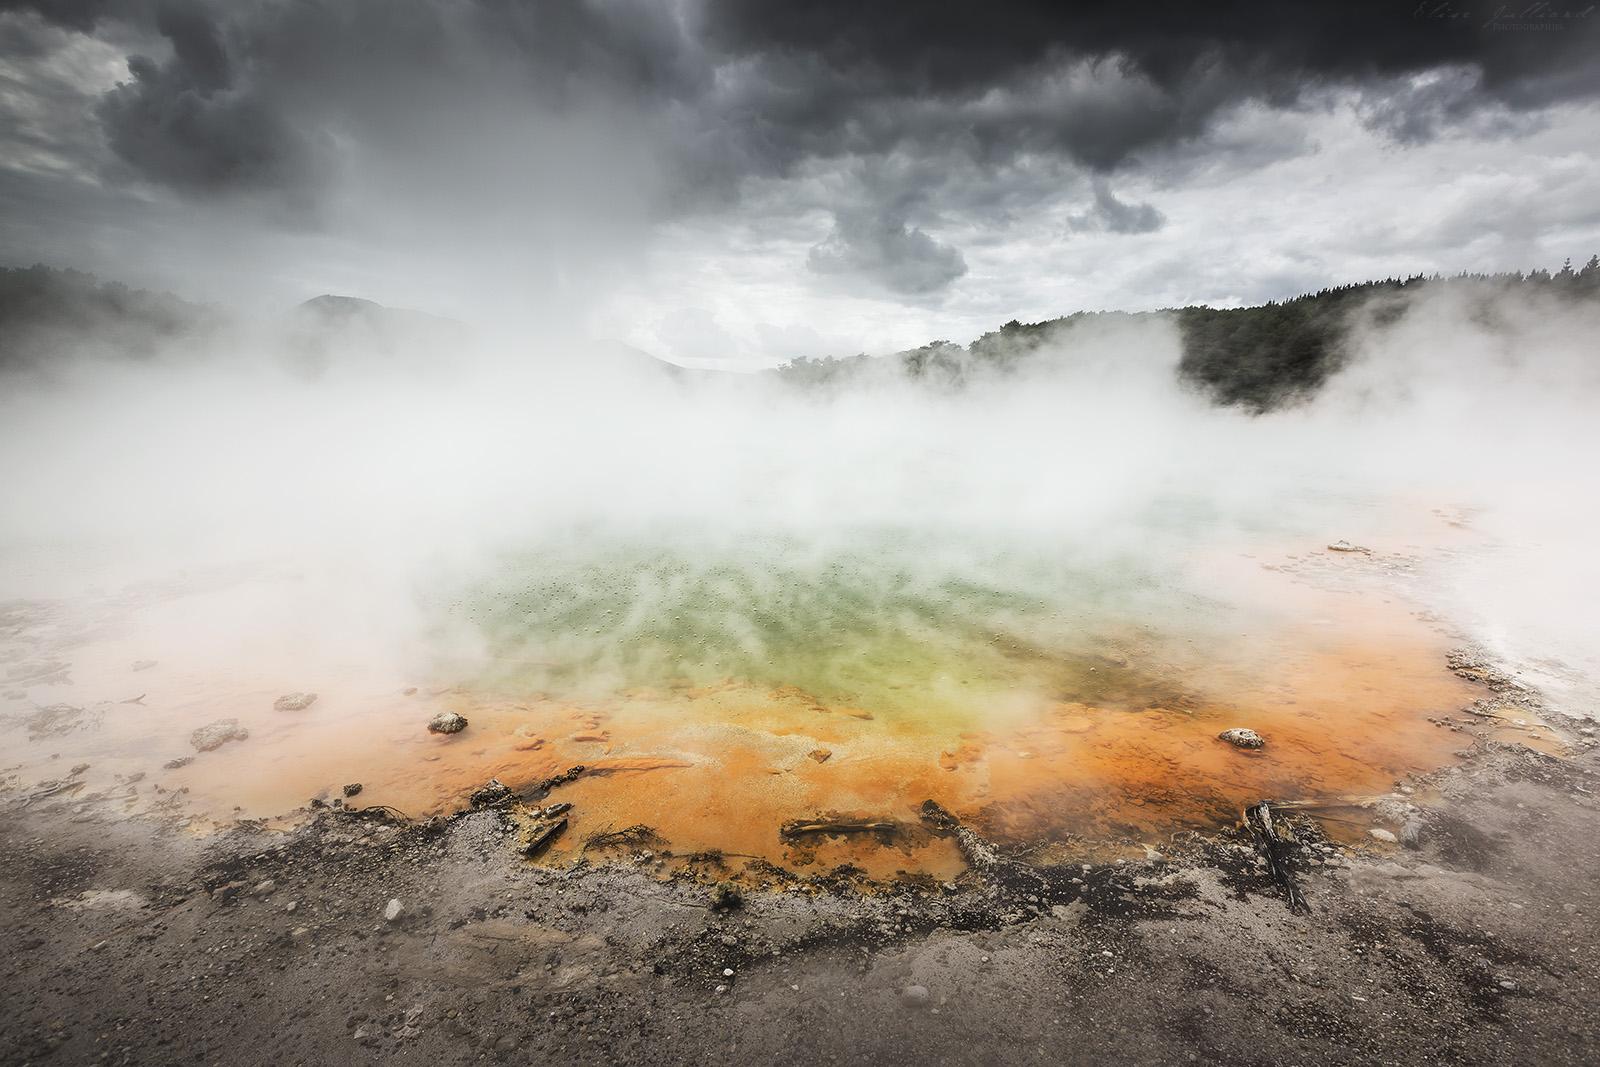 wai-o-tapu-rorotua-new-zealand-nouvelle-zelande-north-island-ile-nord-champagne-pool-waikato-taupo-volcanic-volcan-volcano-zone-geothermal-travel-voyage-Aotearoa